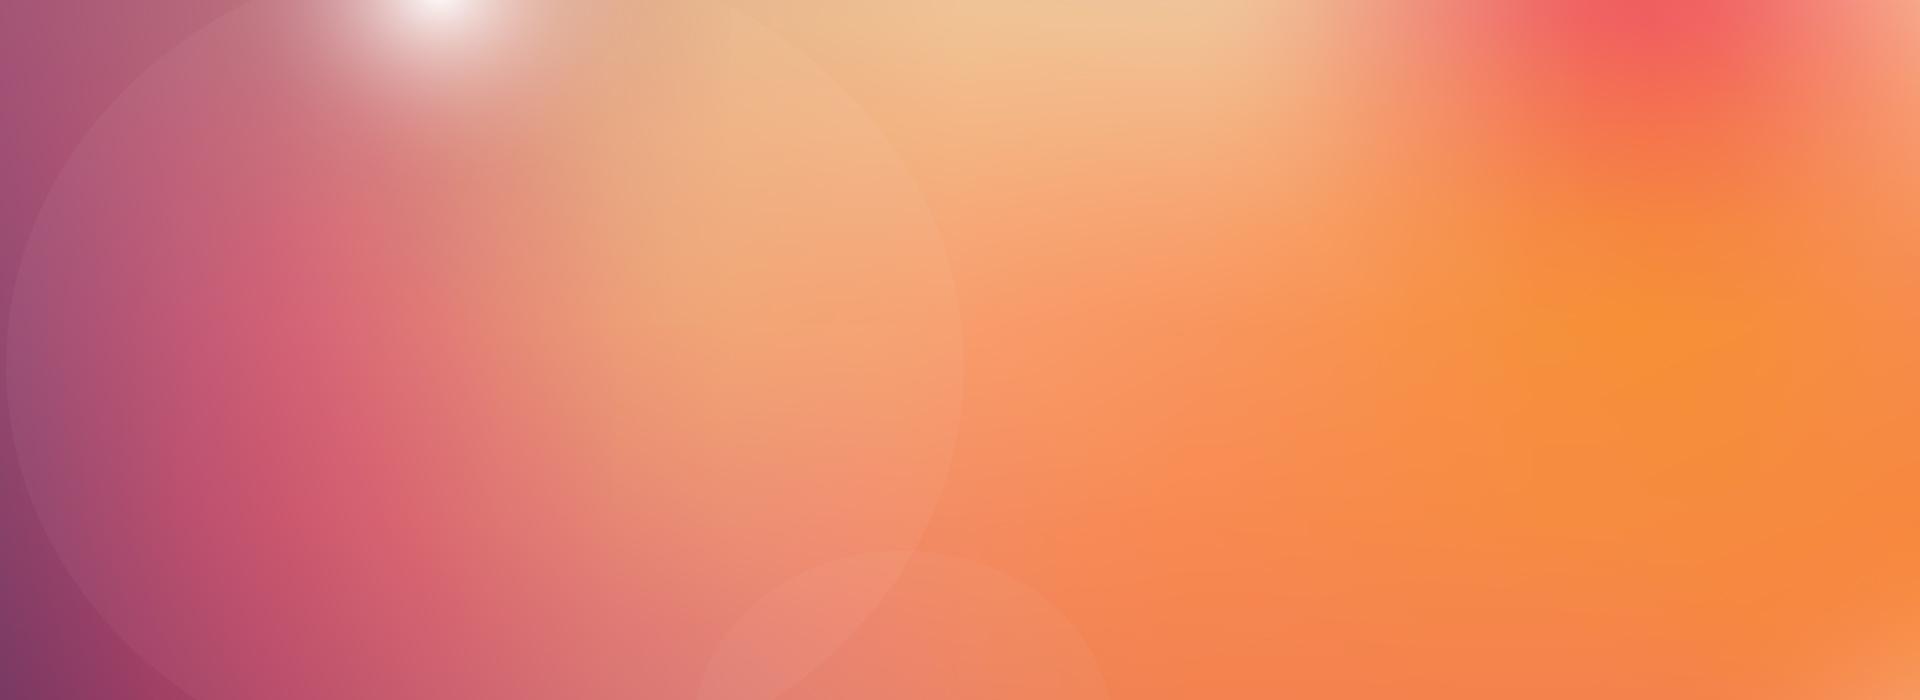 Fondo-blur3